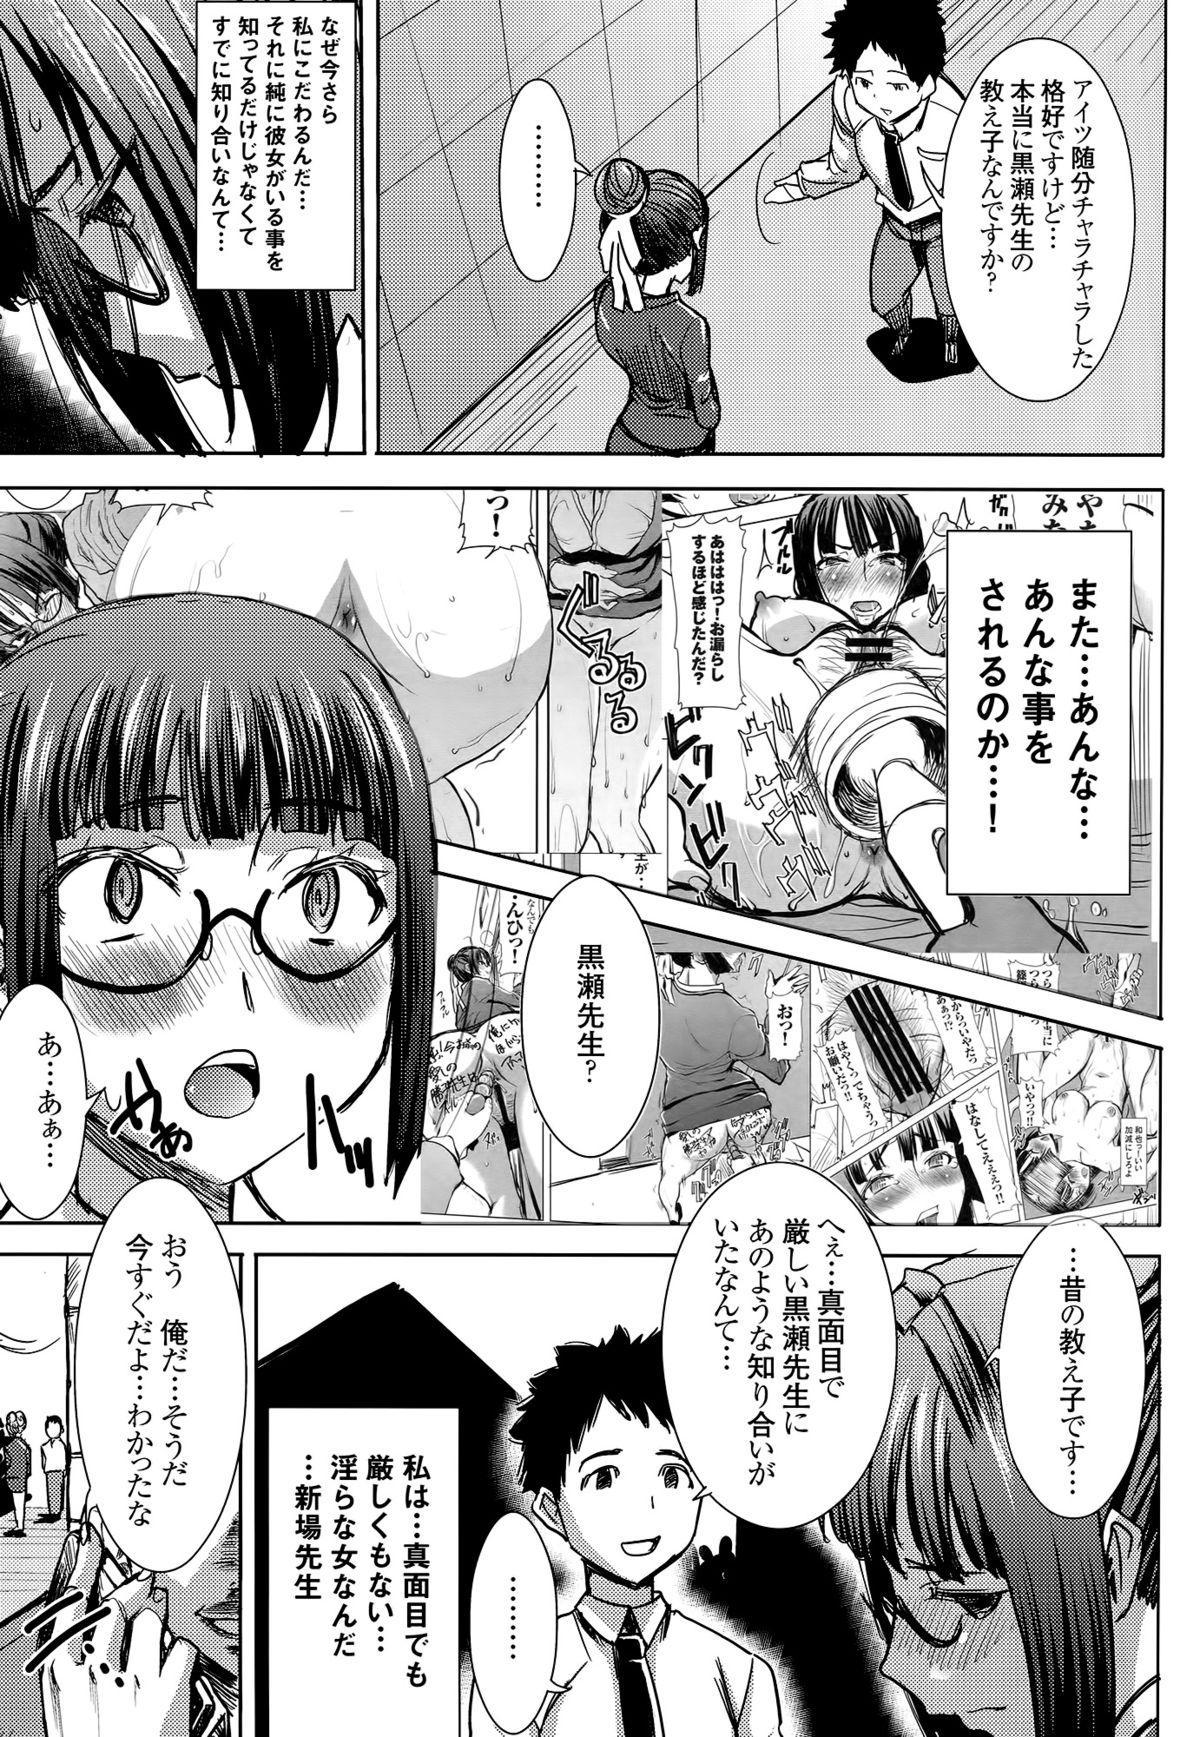 Unsweet Kurose Katsuko Plus Kakugo... 5